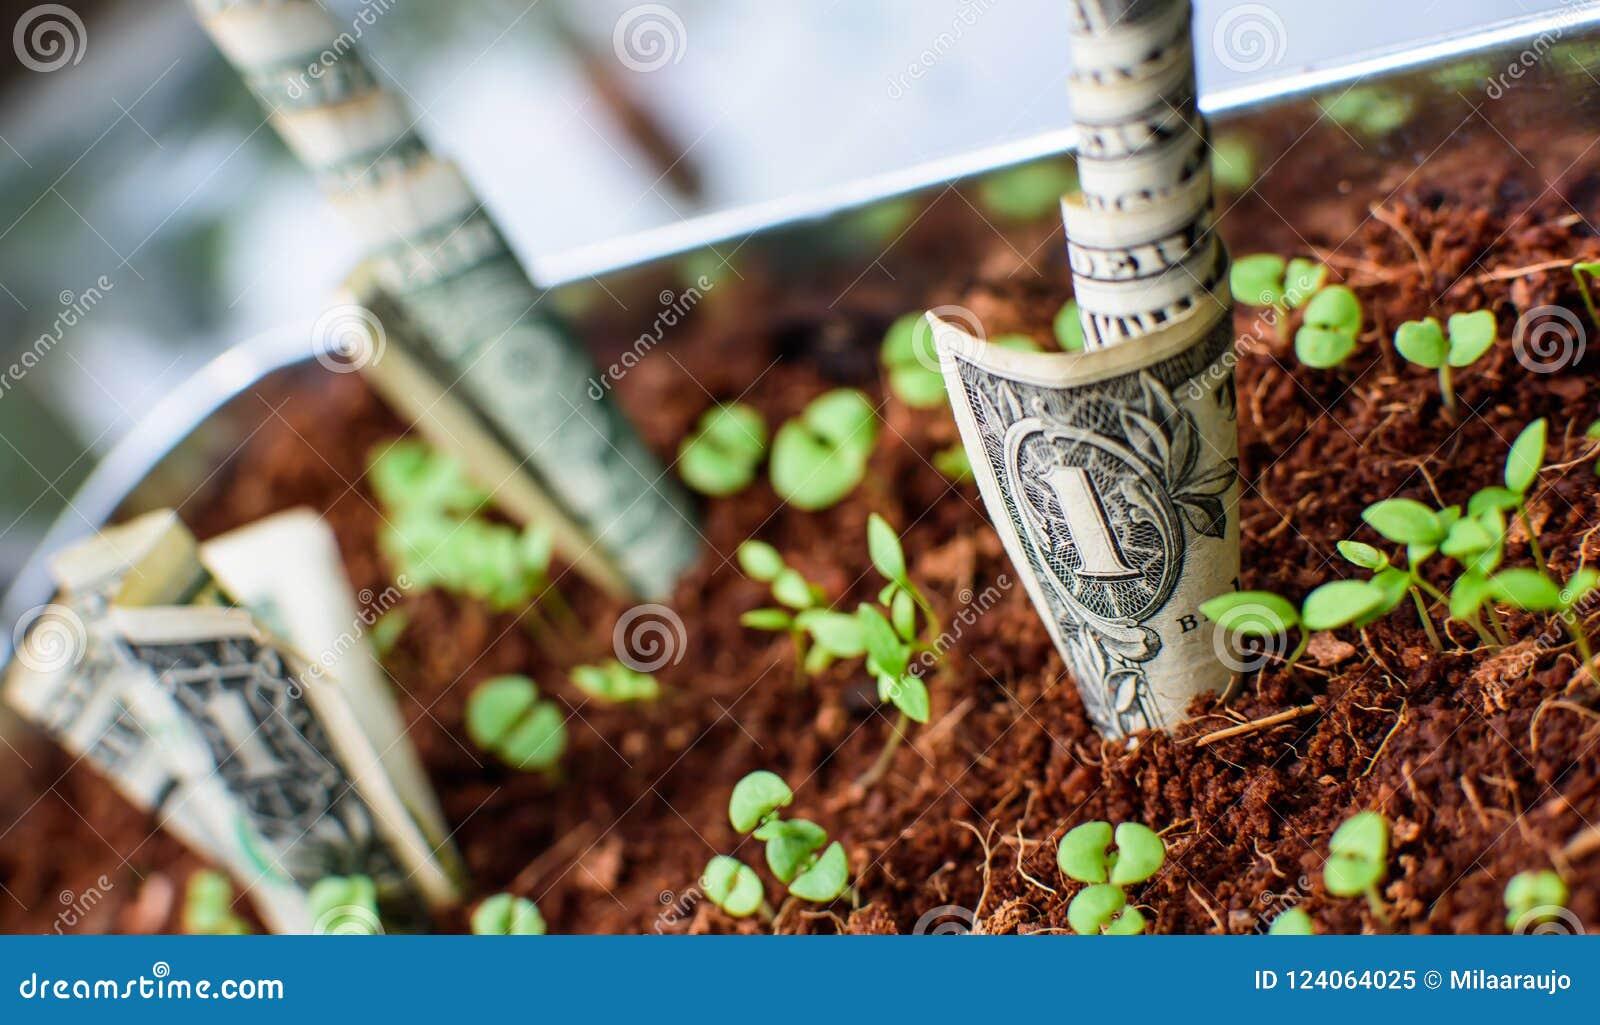 Money Growing Dollar Bills Sprouting Stock Image - Image of poster ...